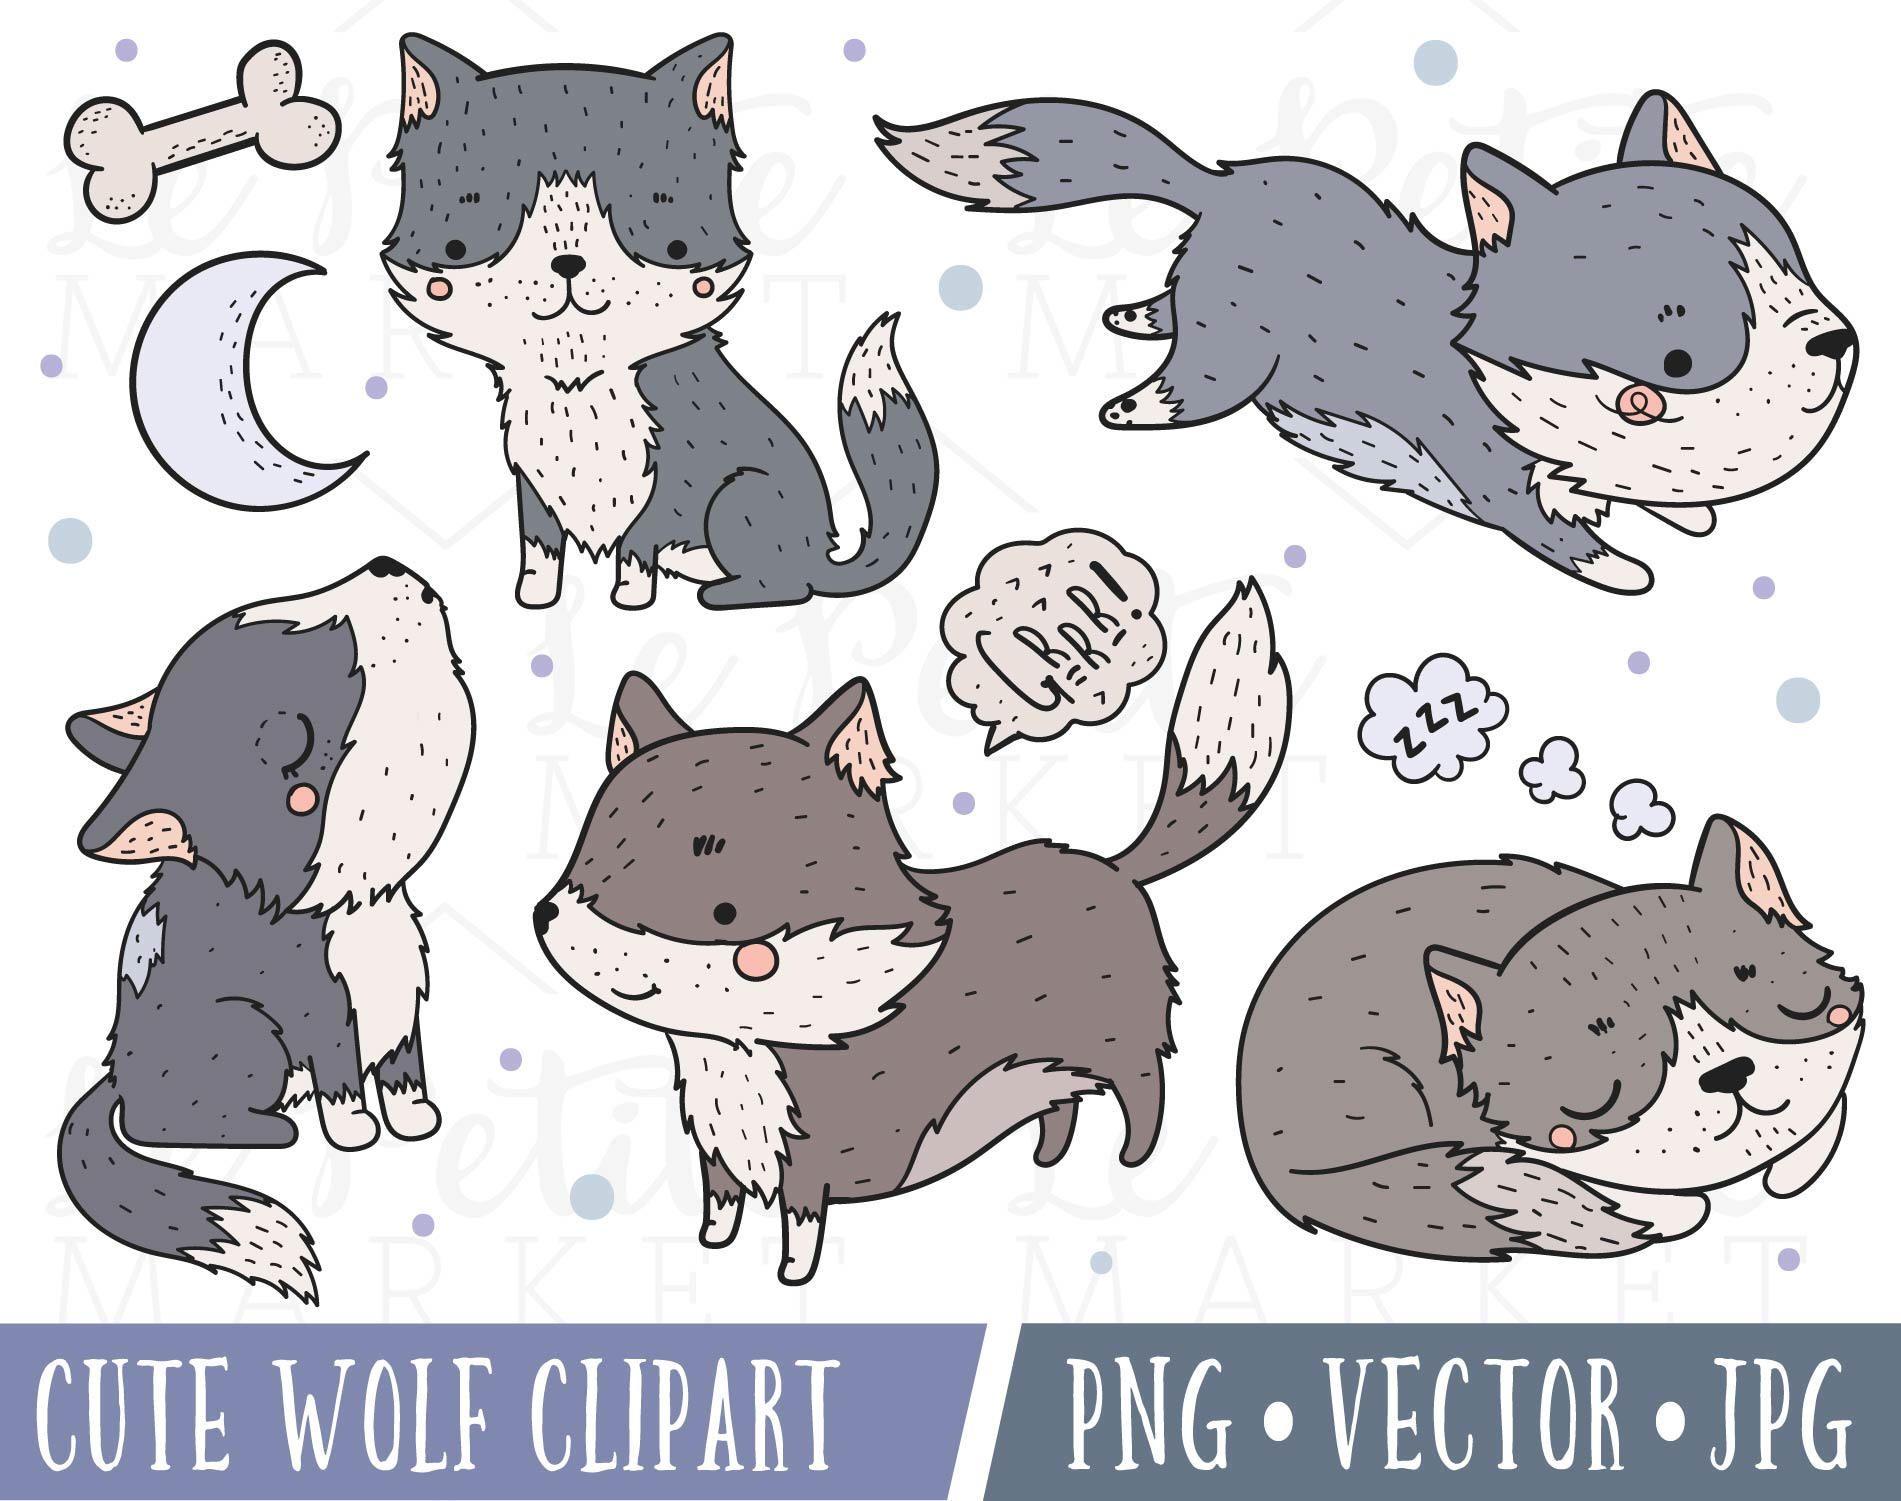 Husky clipart wolf. Cute images clip art